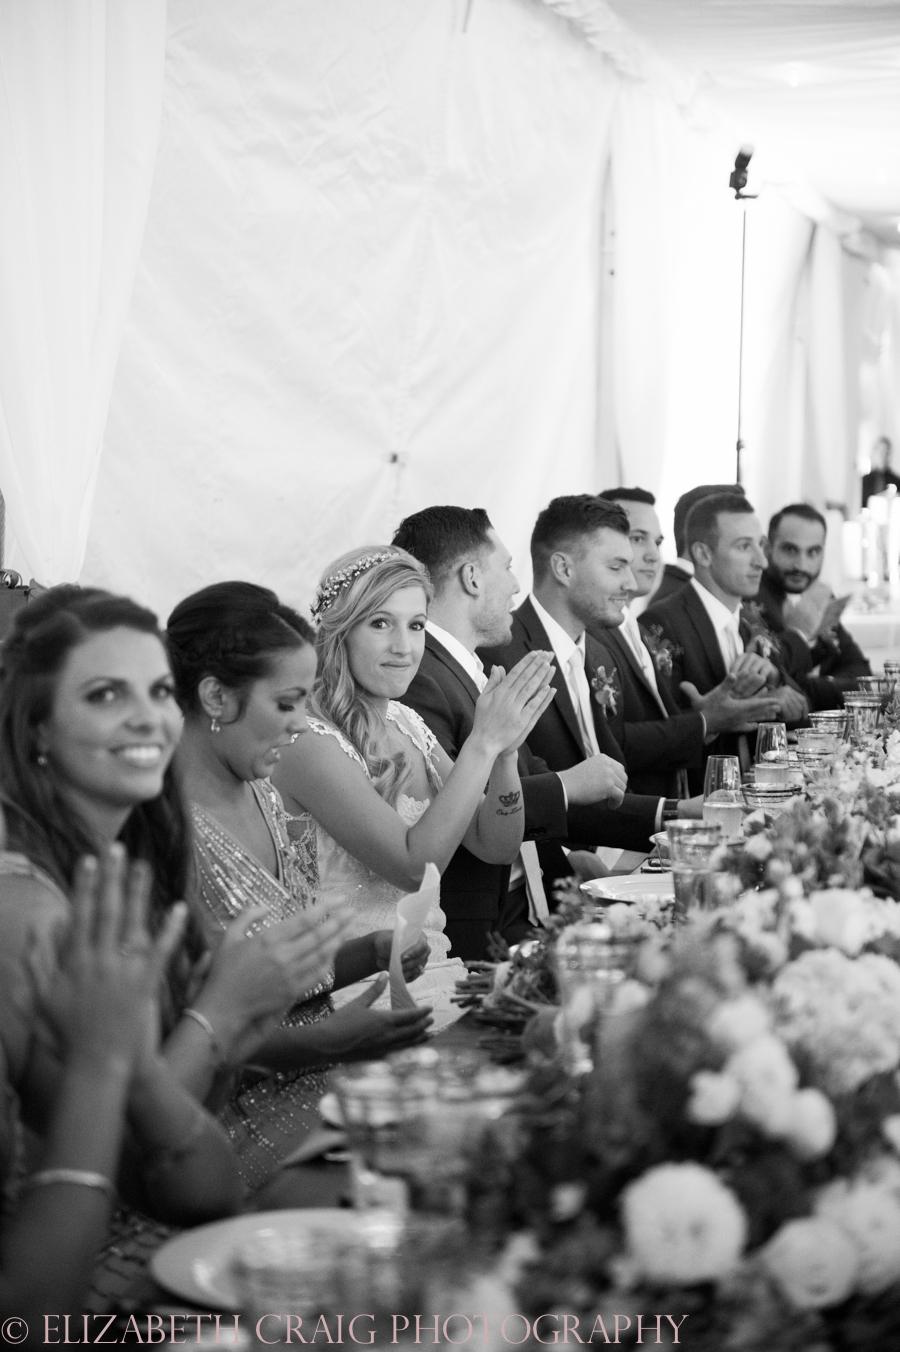 Dubois Brockway St. Marys PA Weddings-0211